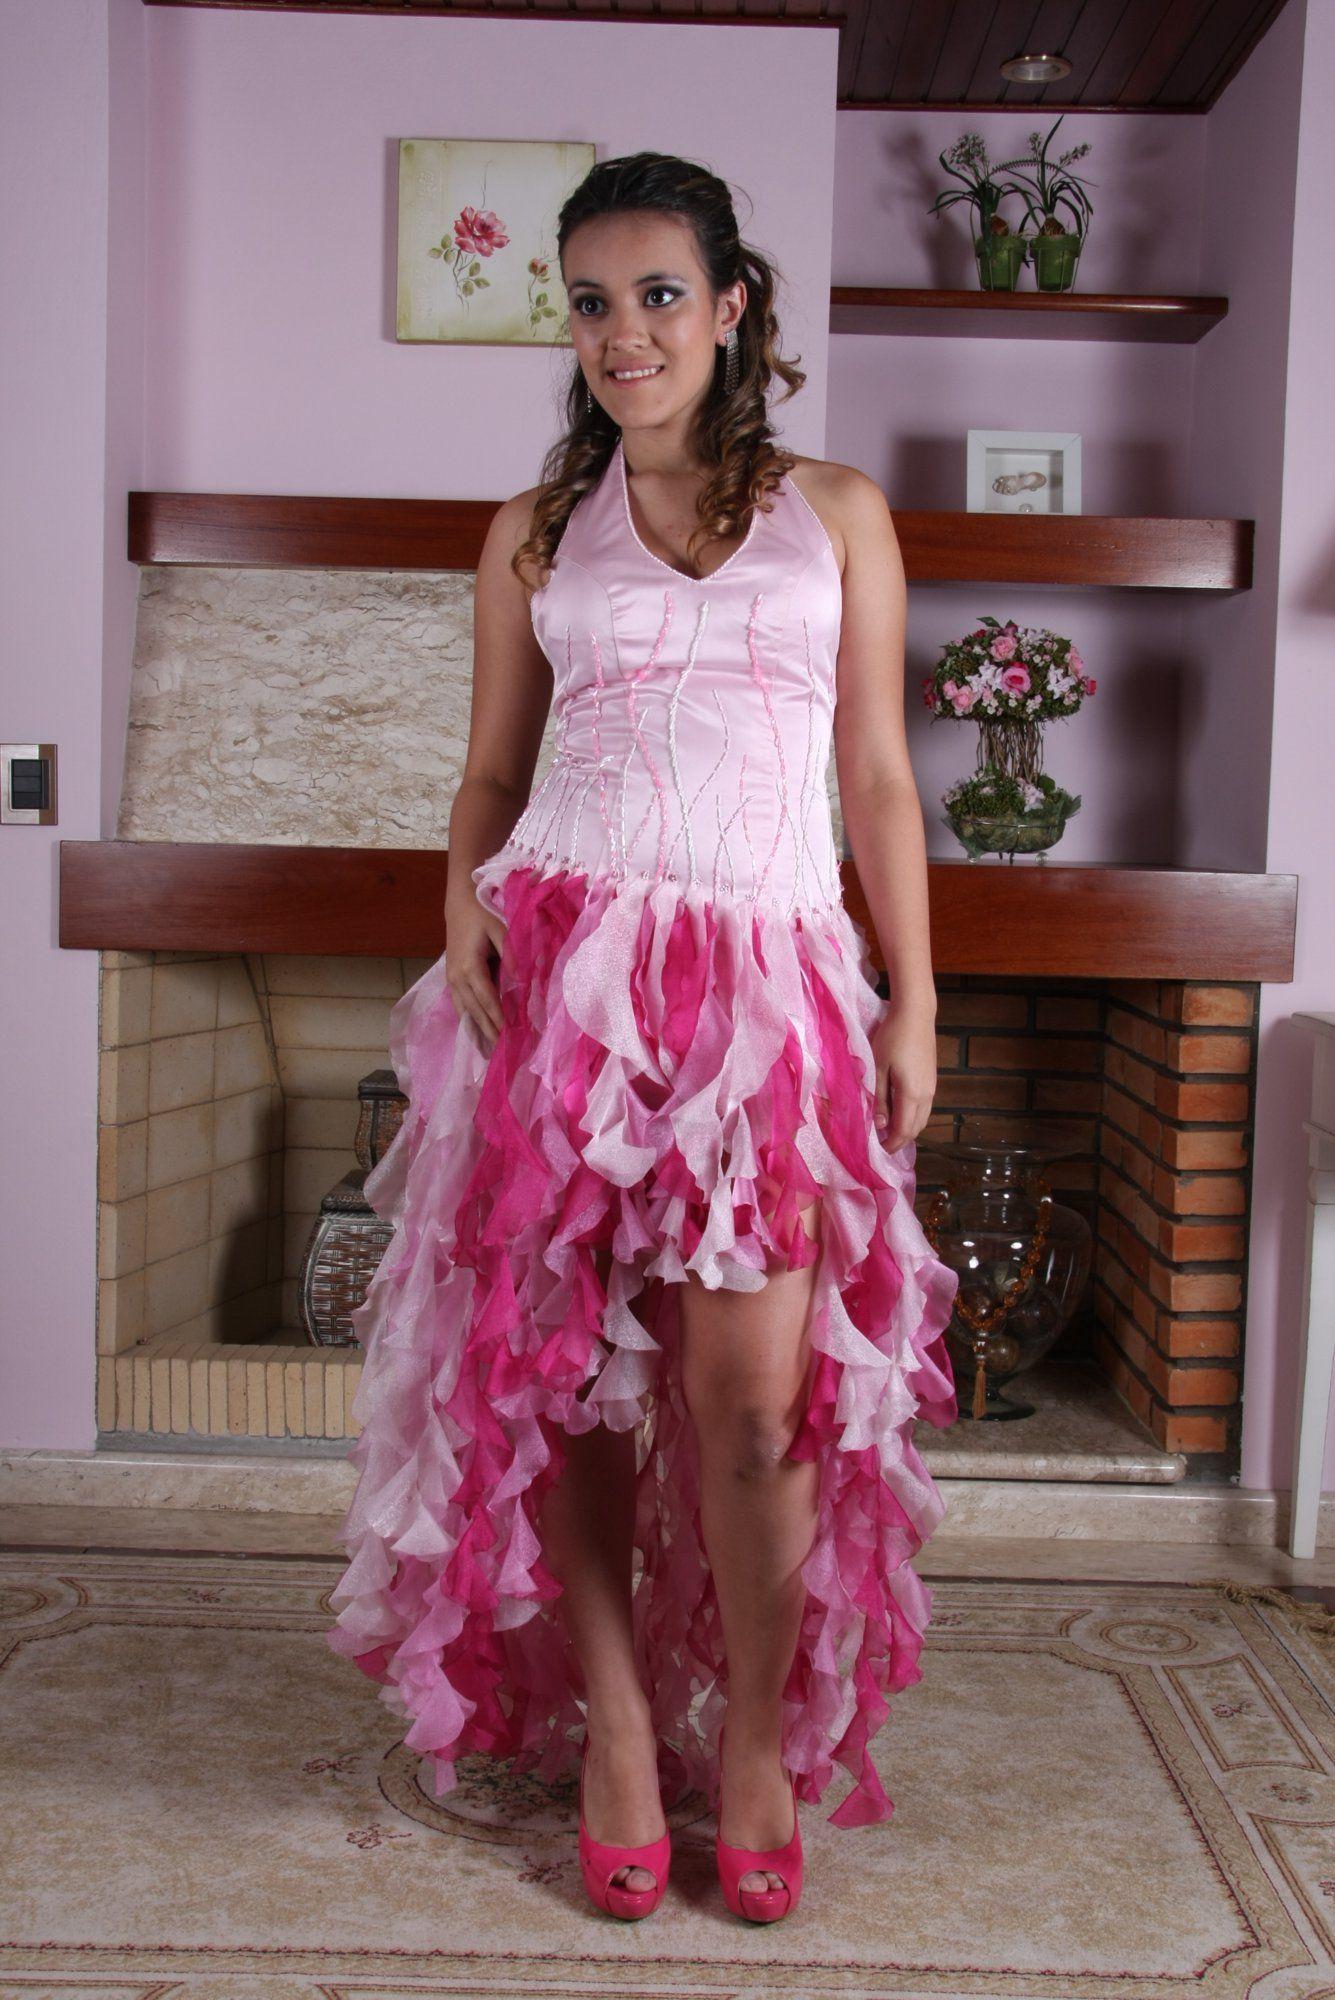 Vestido de Debutante Pink - 16 - Hipnose Alta Costura e Spa para Noivas e Noivos - Campinas - SP Vestido de Debutante, Vestido de Debutante Pink, Hipnose Alta Costura